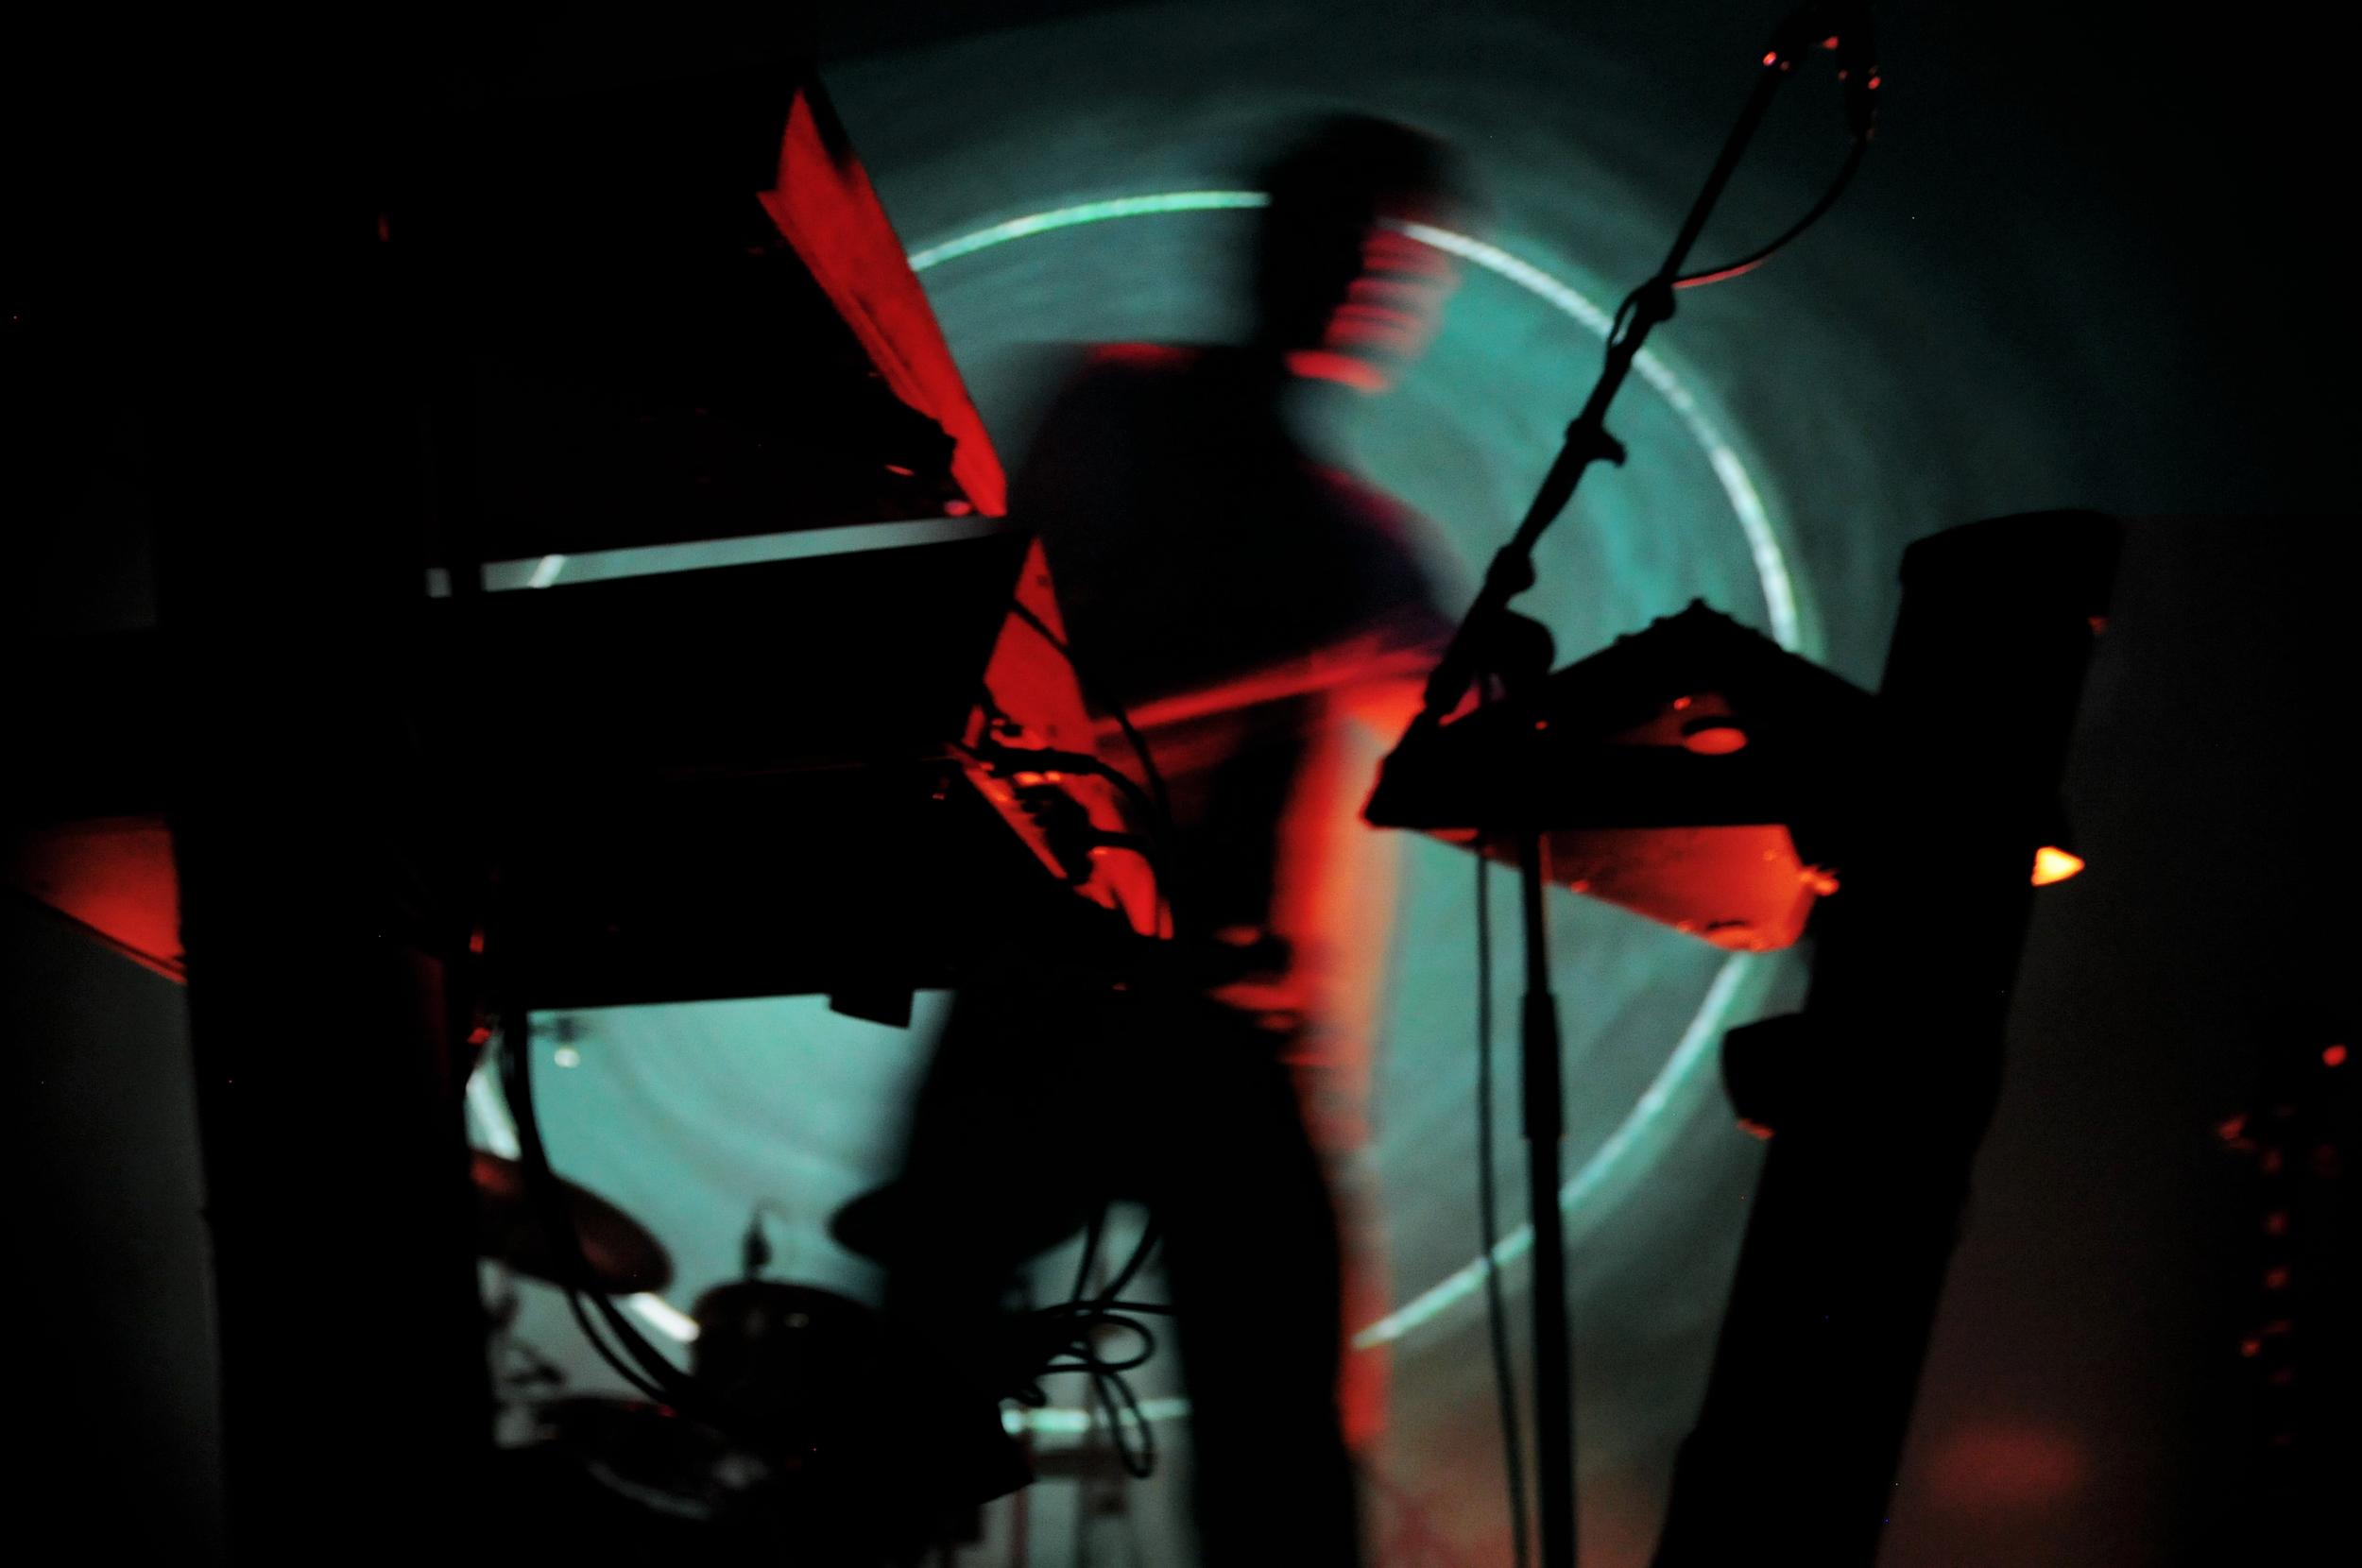 tycho performing photography by floriana castagna | S/TUDIO